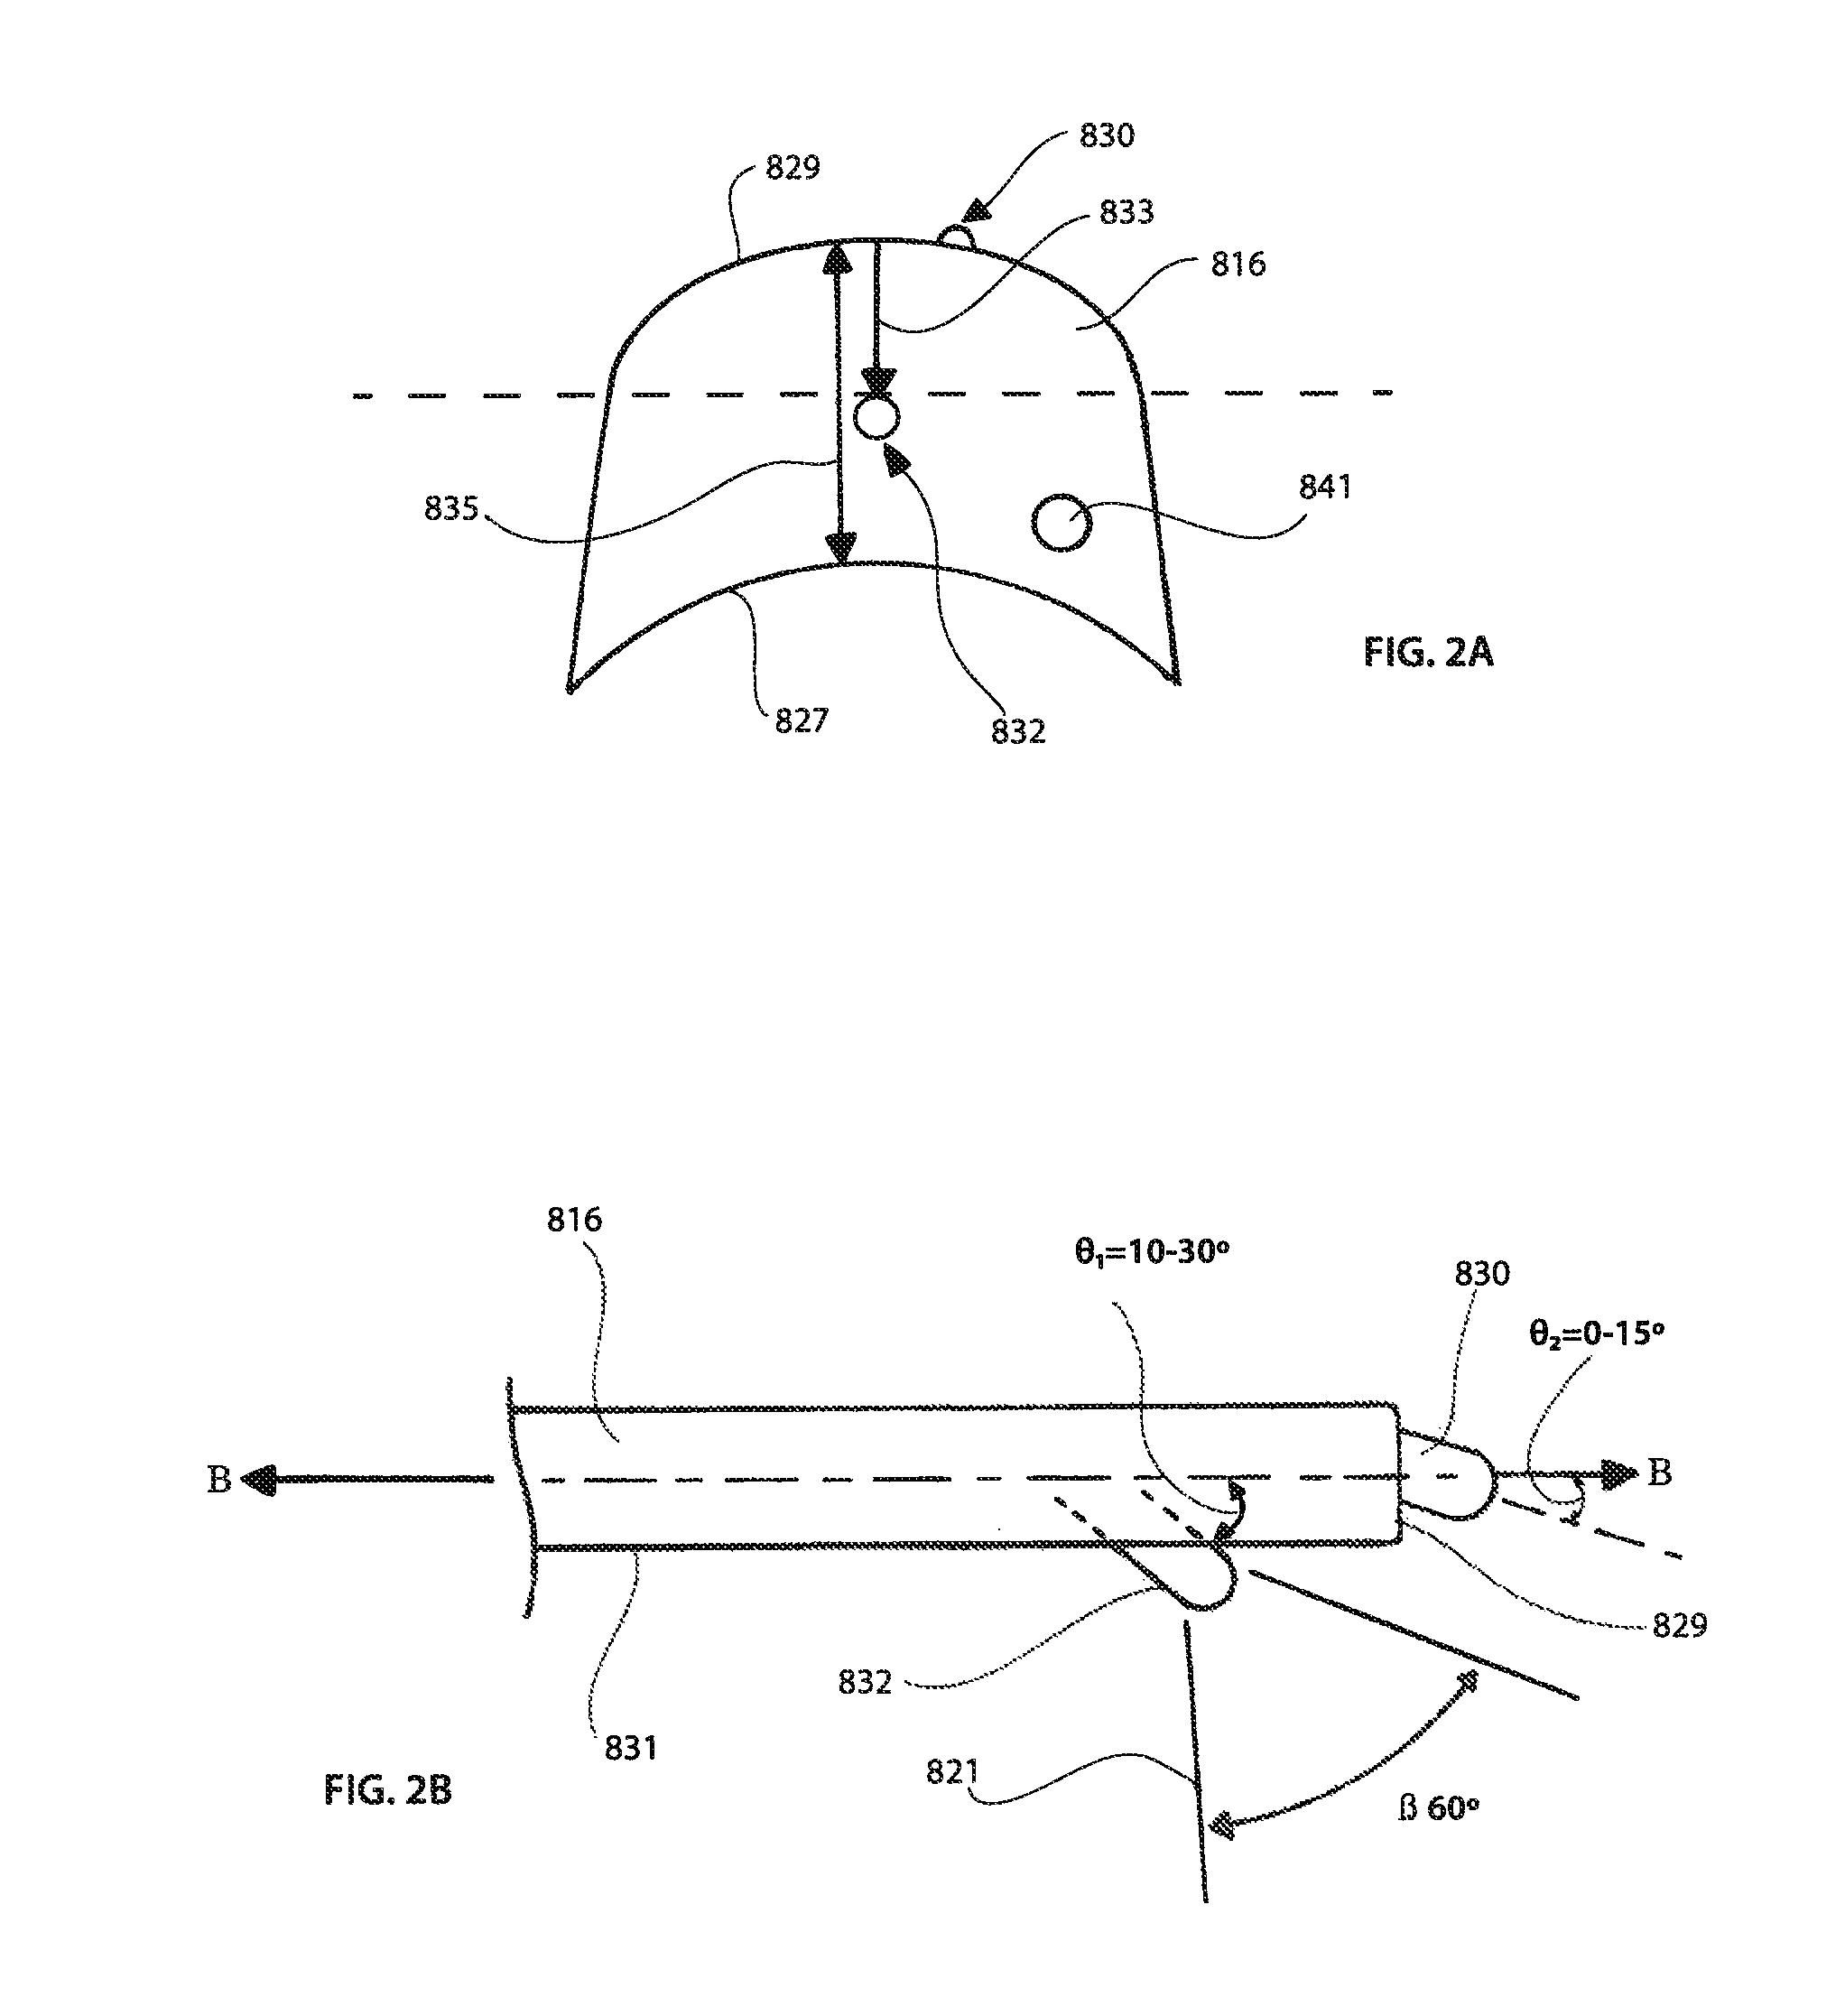 Patent US 9,609,902 B2 on